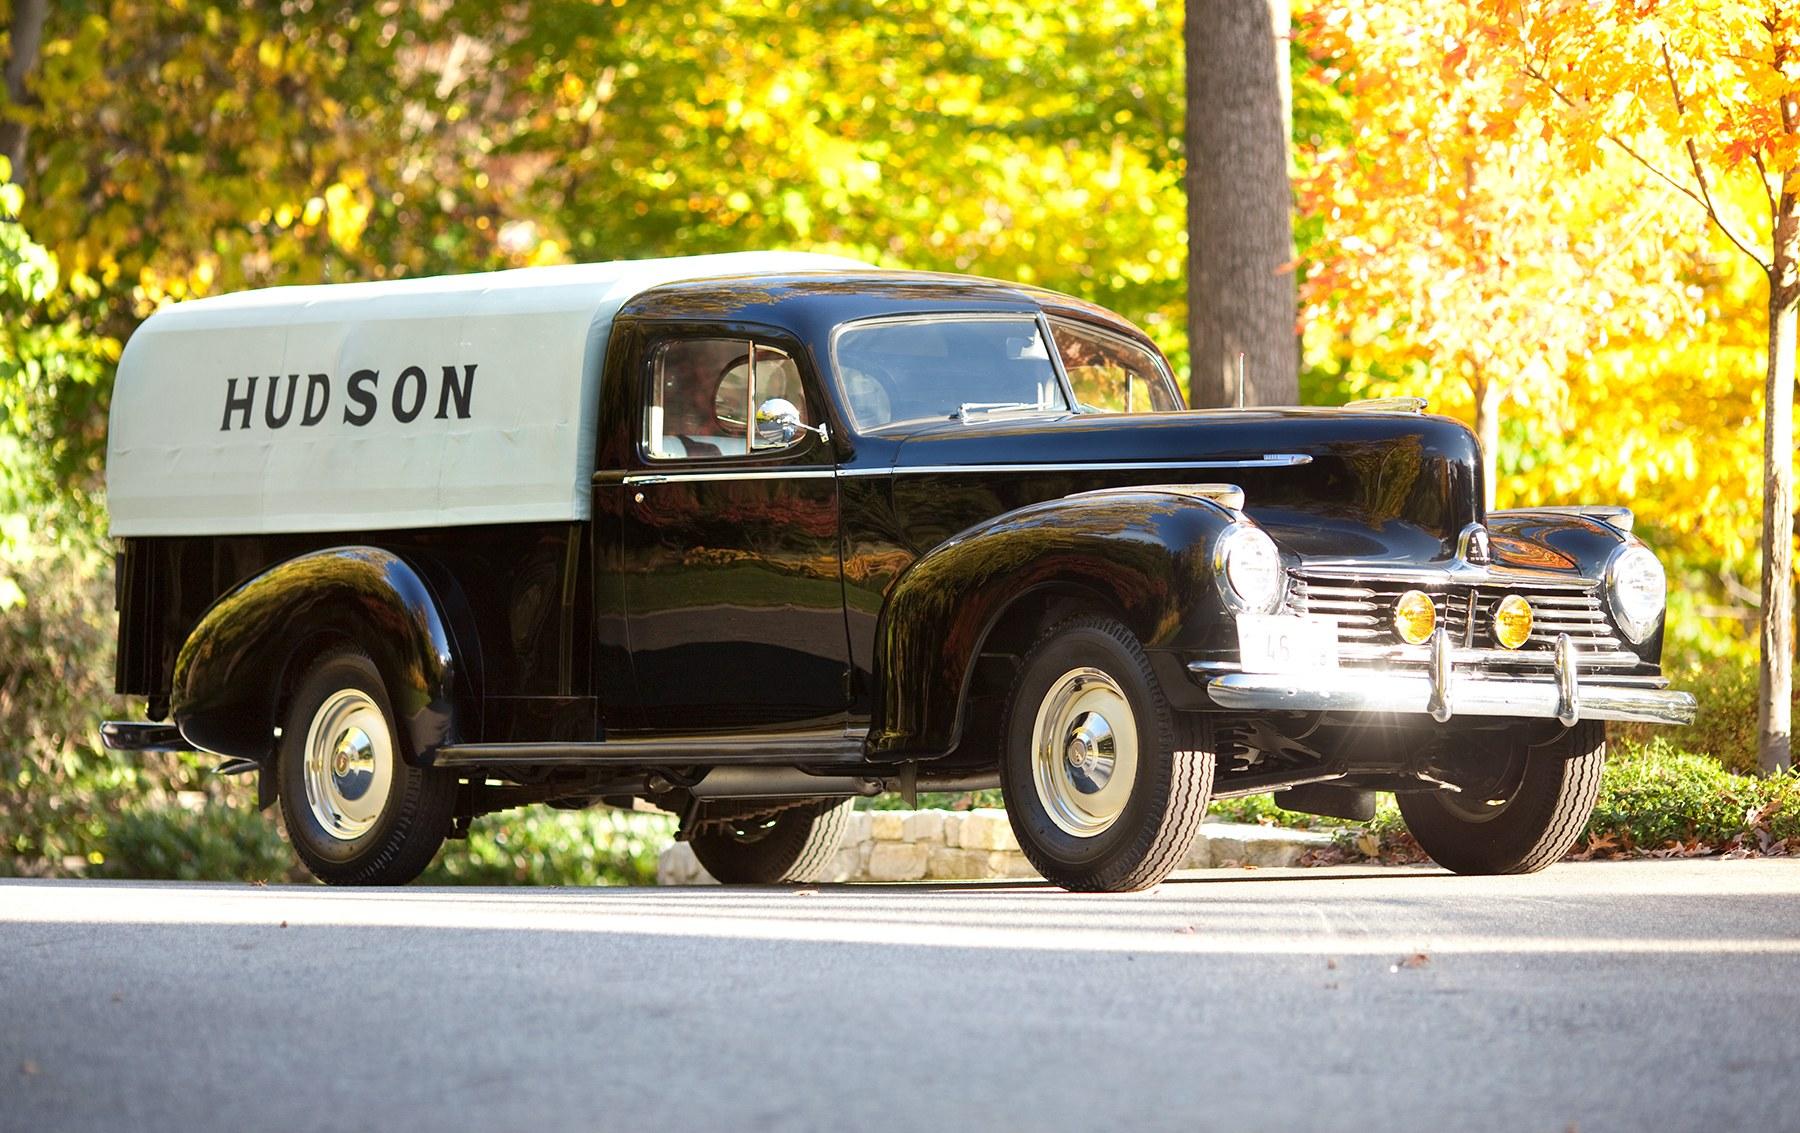 1946 Hudson Series 58 Carrier Six 3/4-Ton Pickup